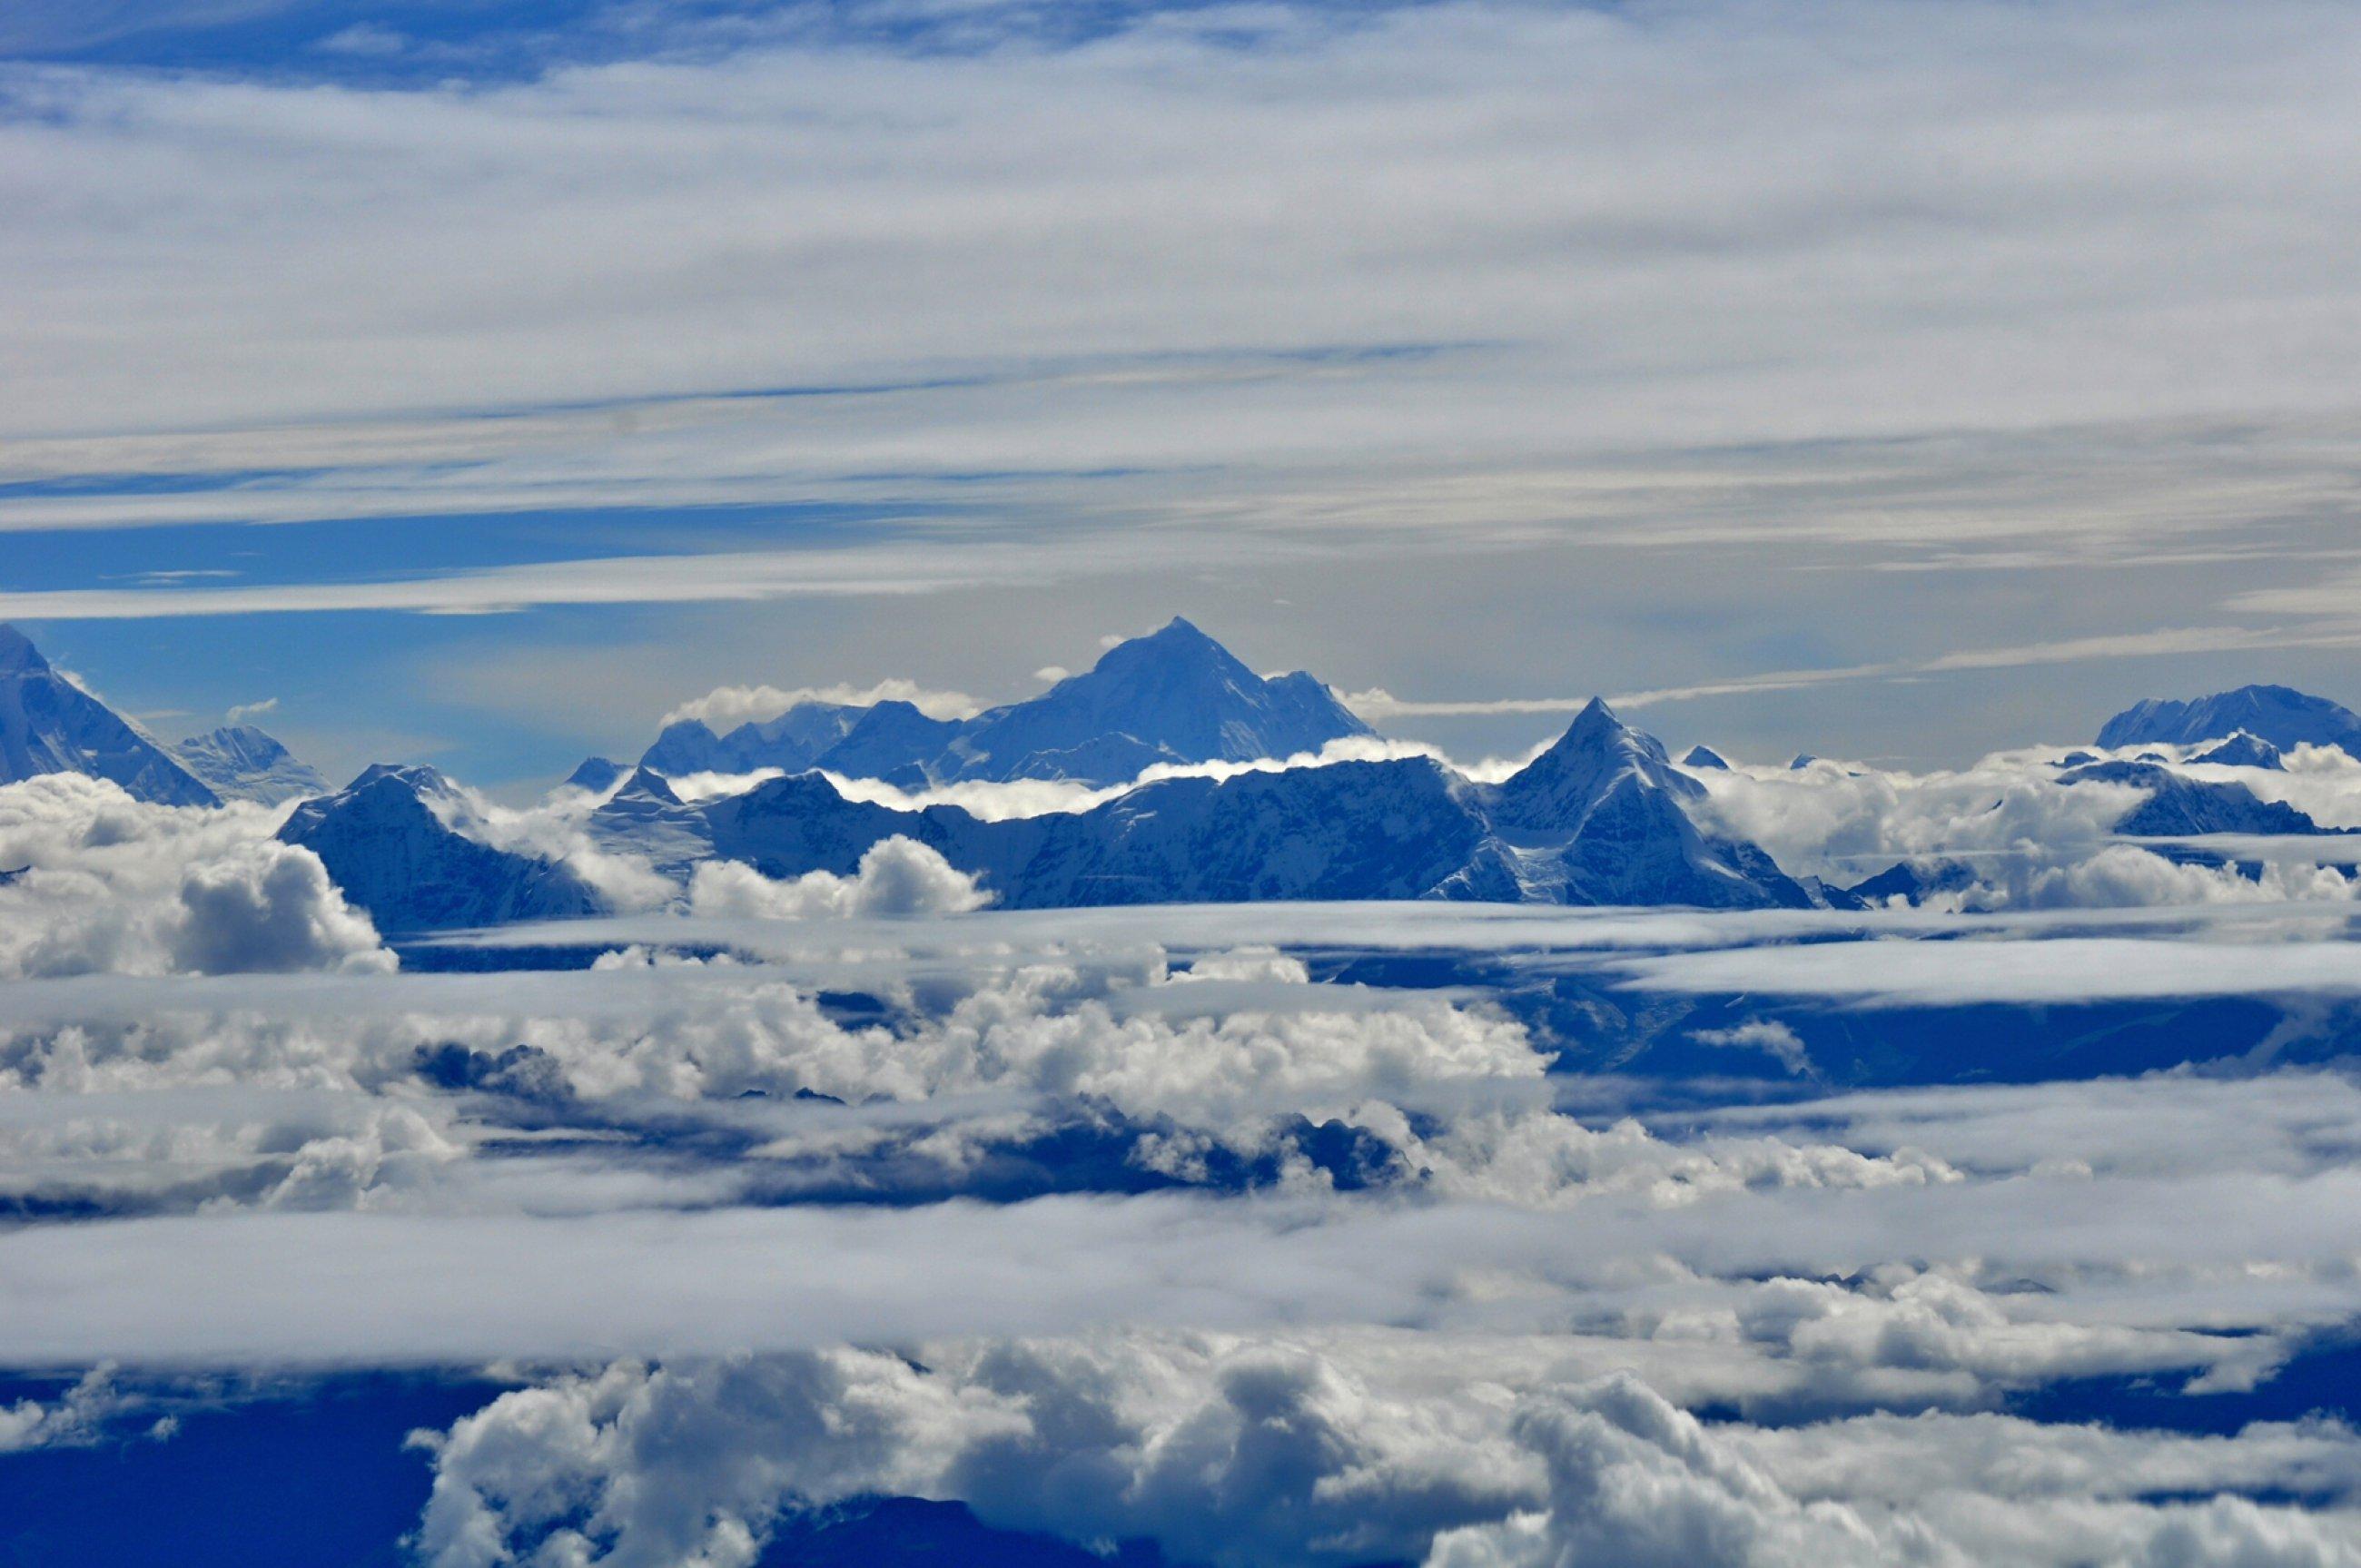 https://bubo.sk/uploads/galleries/16317/nepal-himalaje-let-k-everestu-miro-letasi-1-.jpg